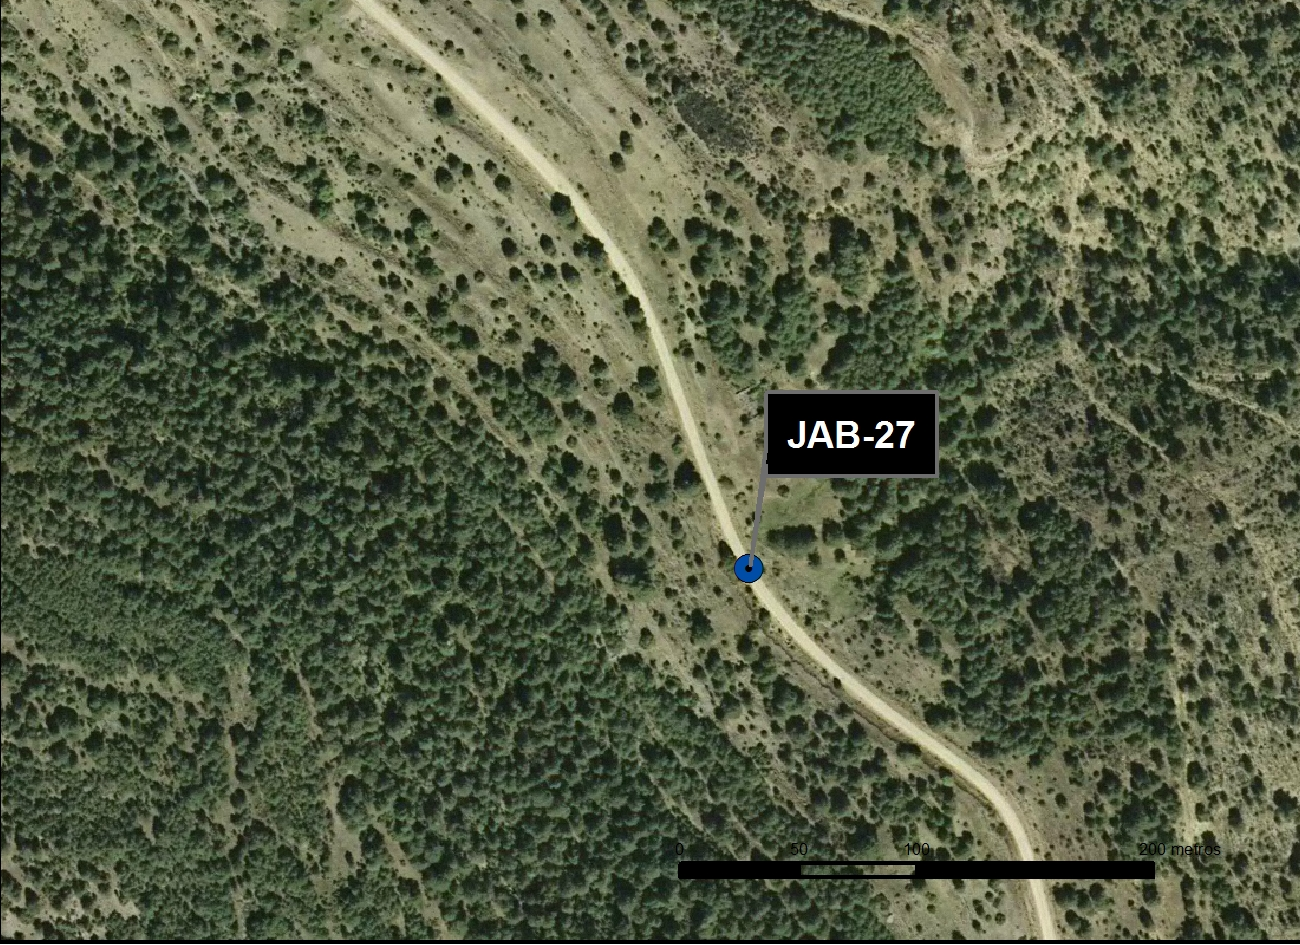 JAB_27_M.V.LOZANO_FUENTECILLAS_ORTO 1